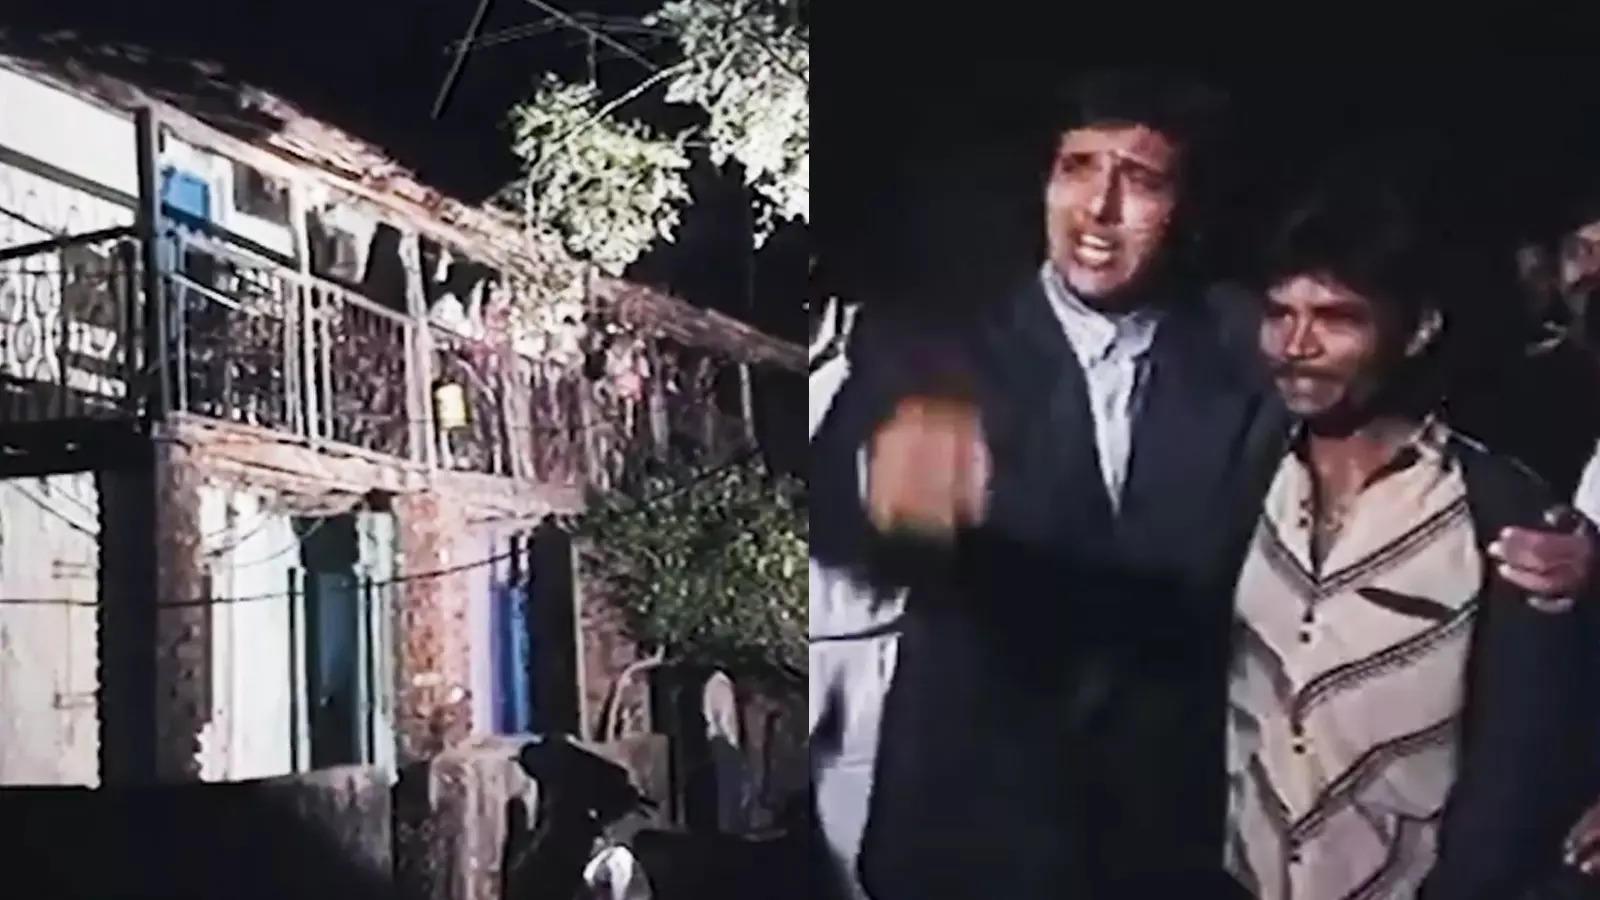 throwback-old-video-of-govinda-visiting-his-childhood-house-in-virar-goes-viral-on-social-media